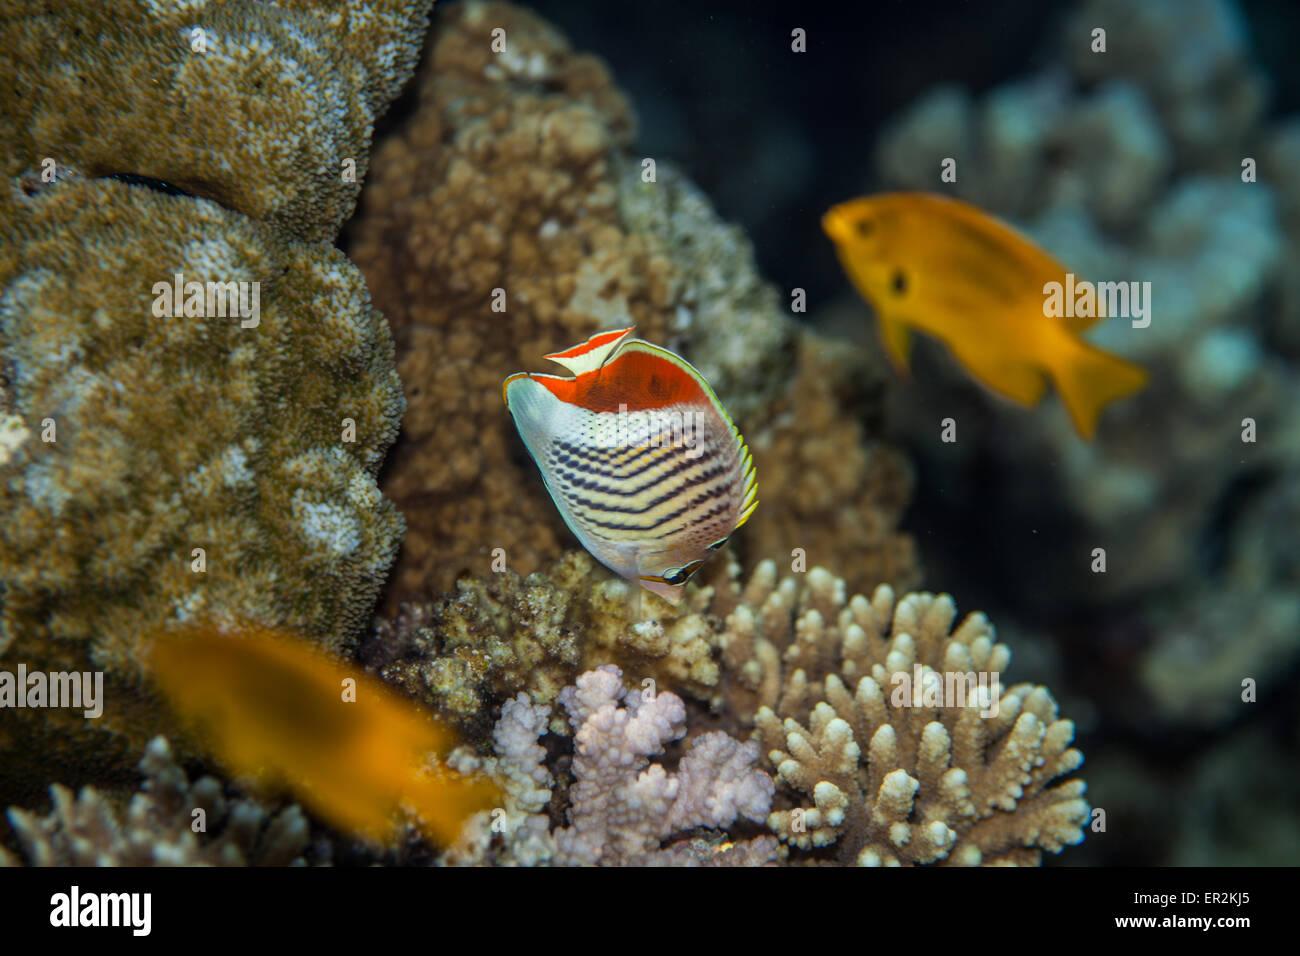 Pesce tropicale - butterflyfish eritreo Immagini Stock